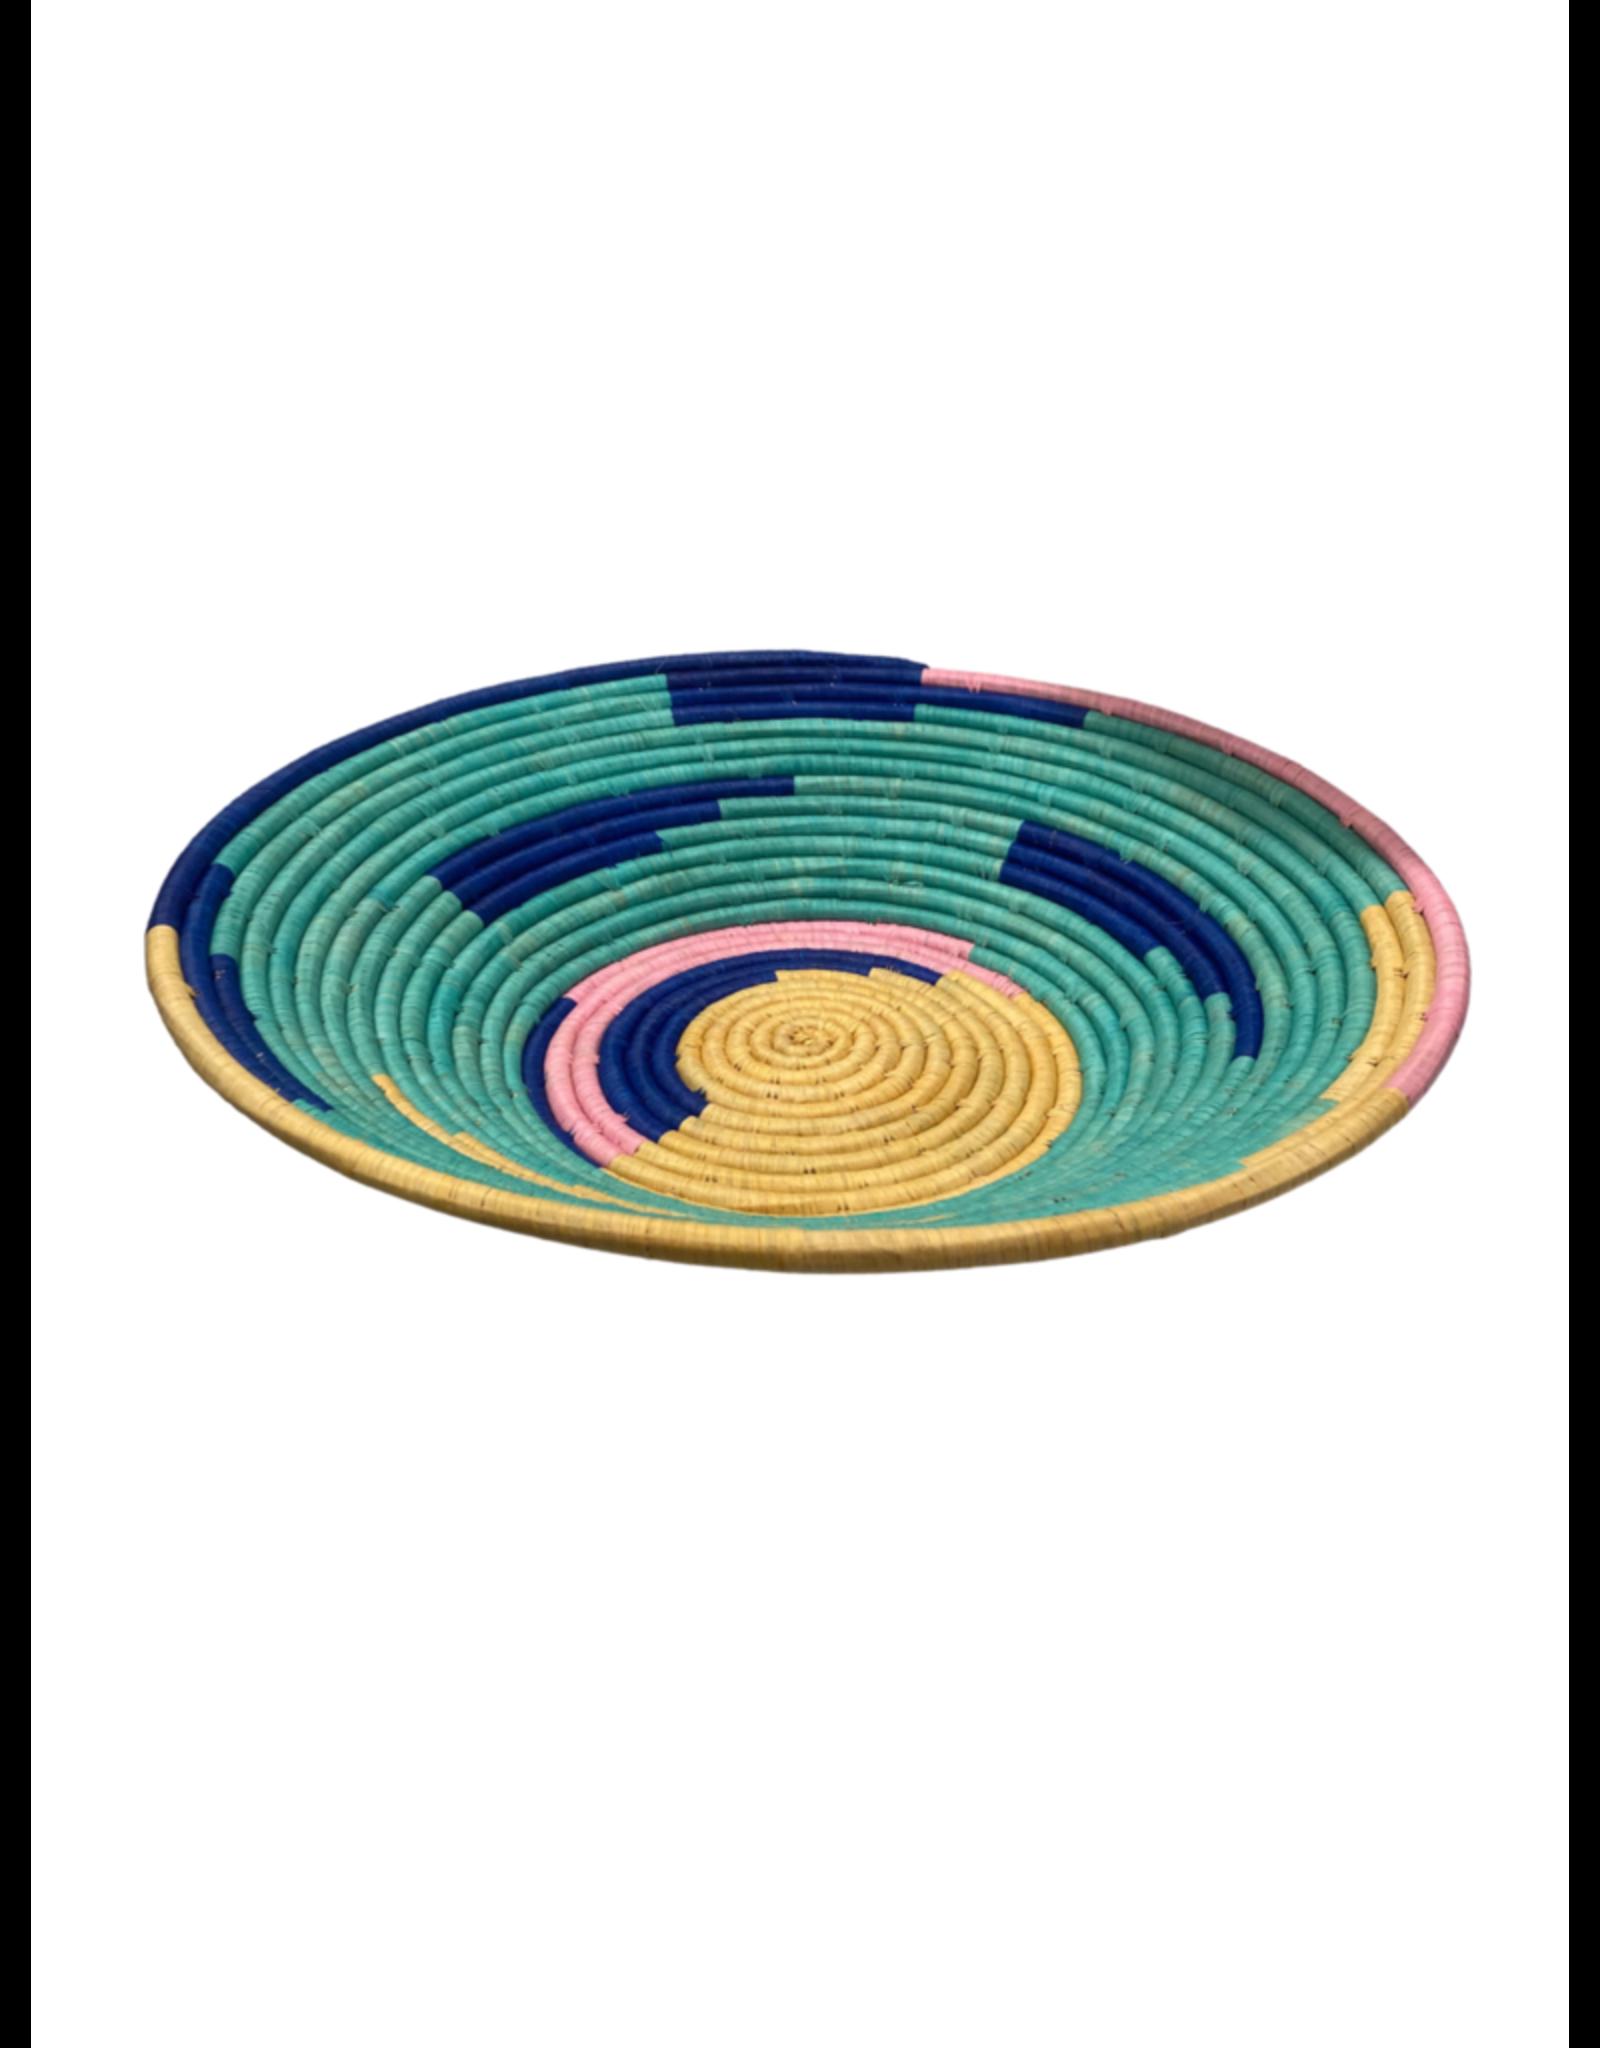 Teal Rafia Coiled Basket